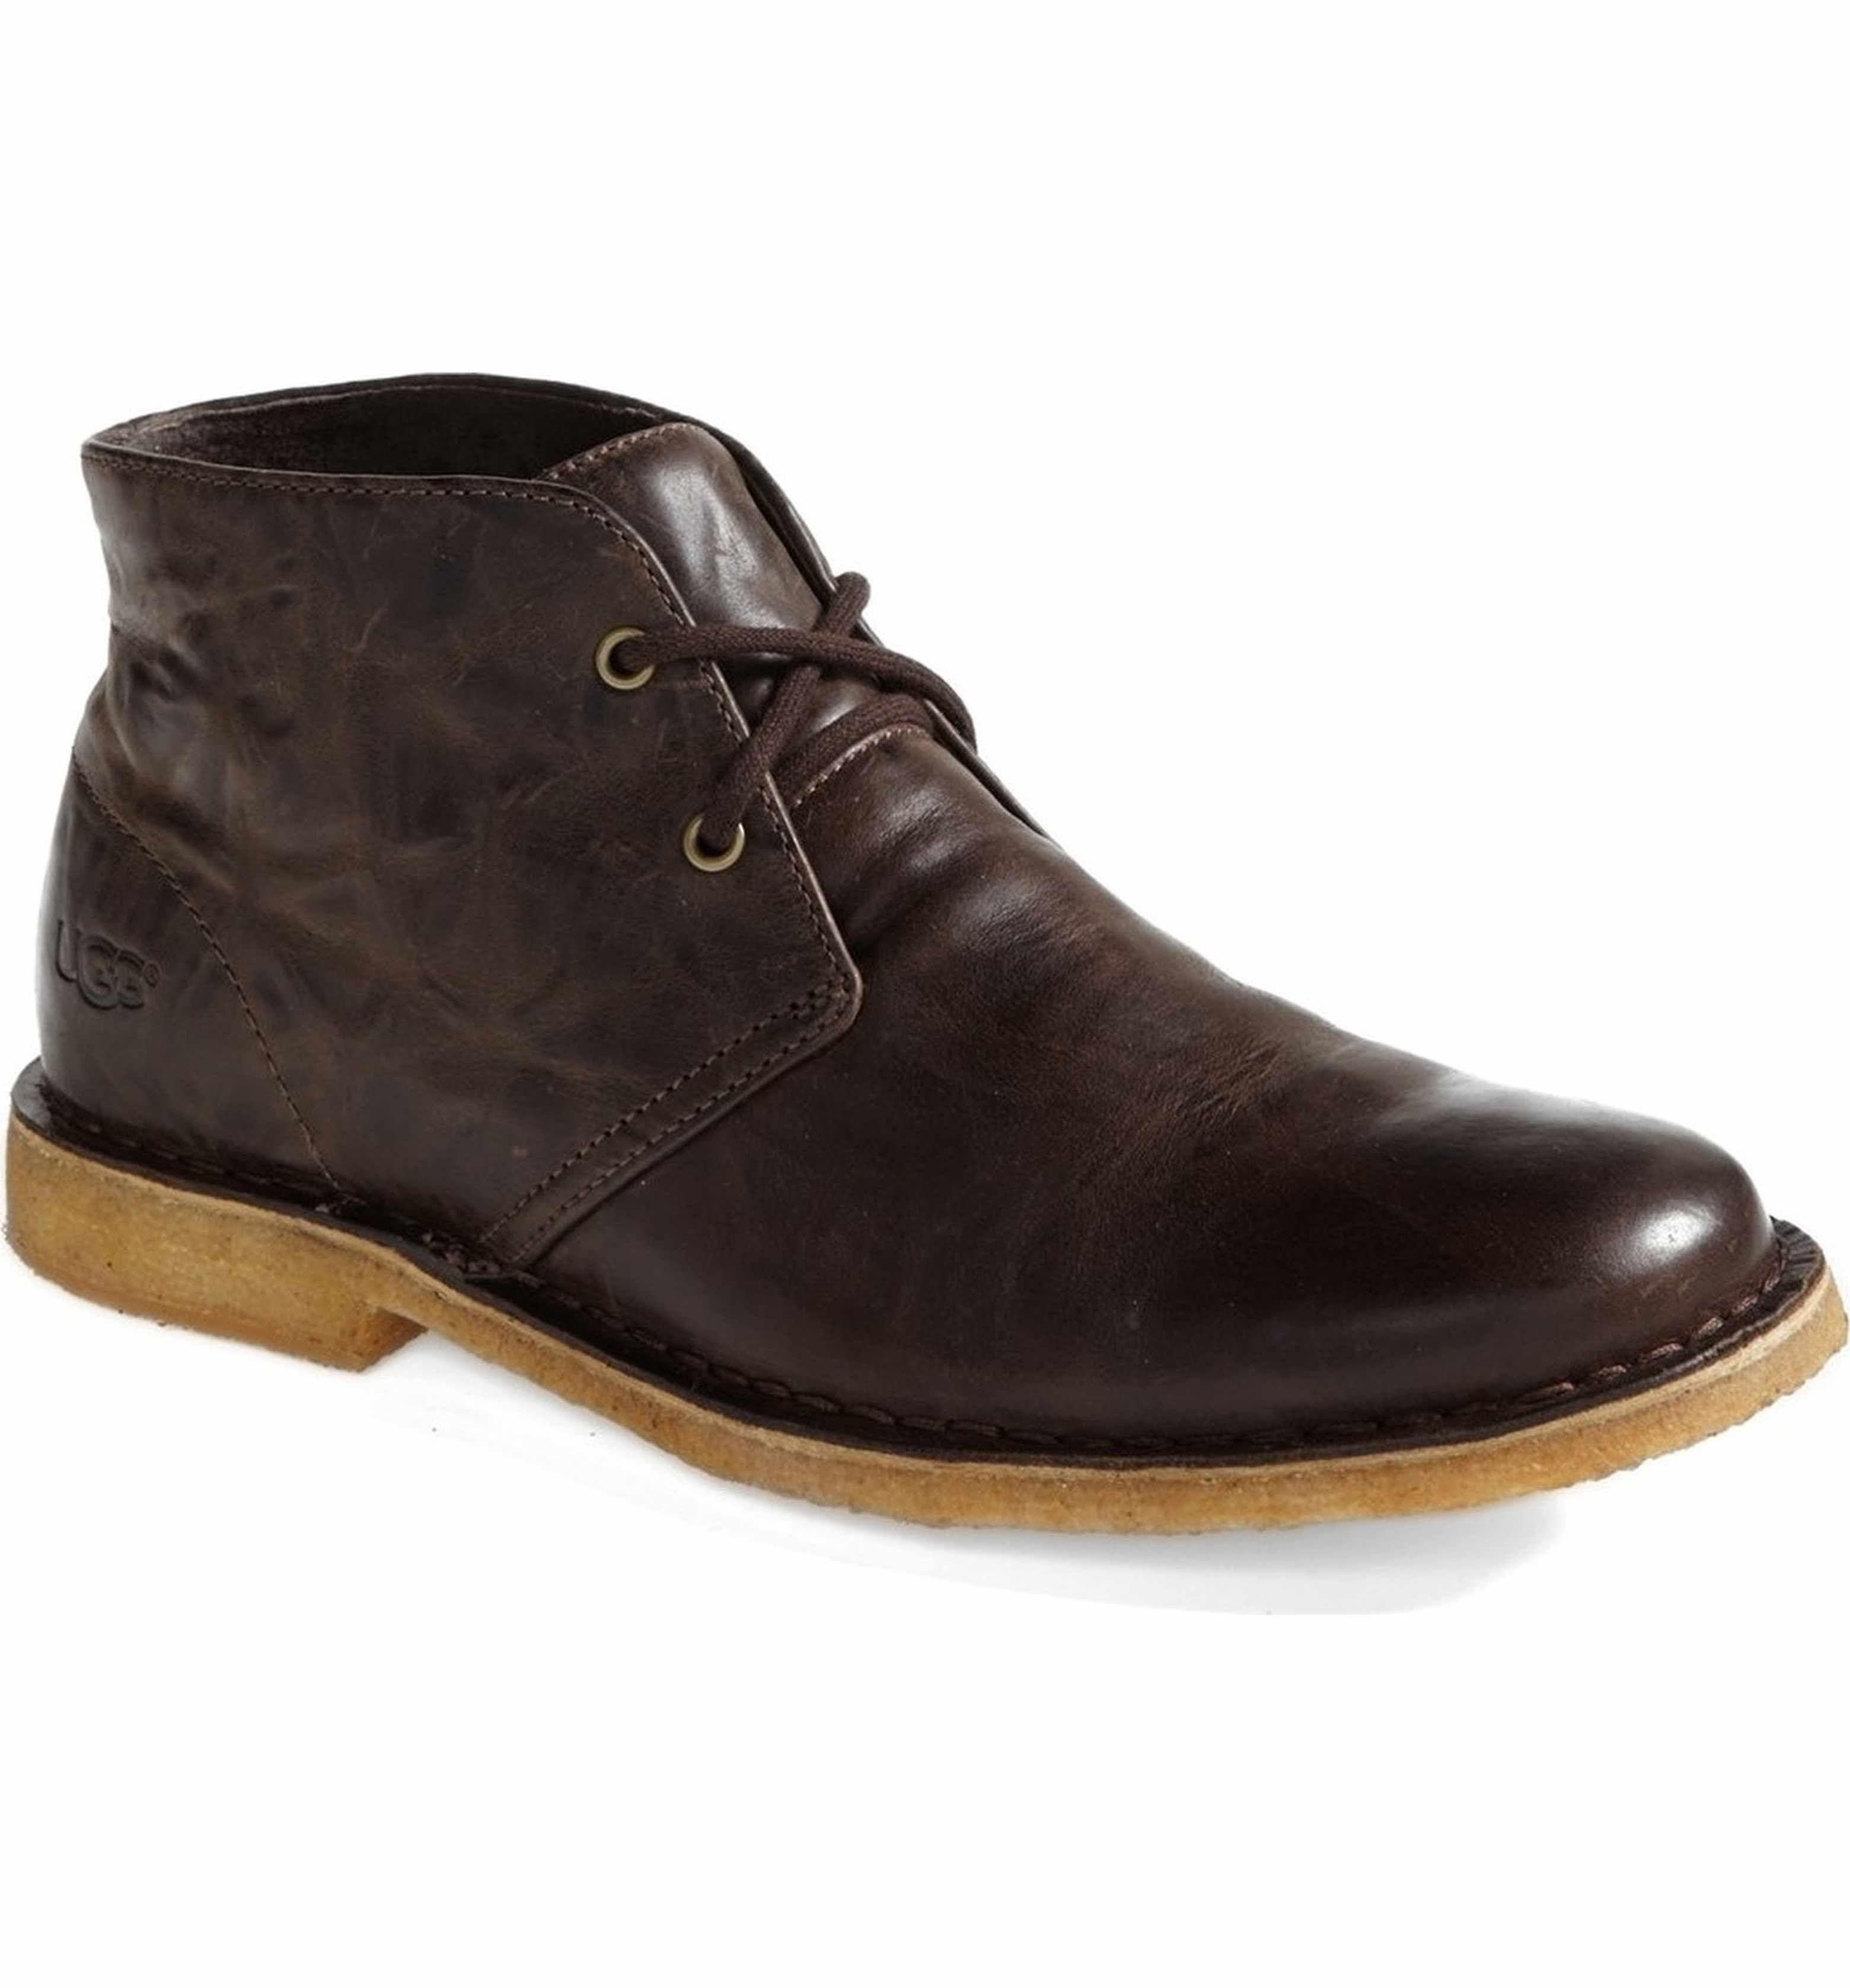 7b28053d0e9 Main Image - UGG® Leighton Chukka Boot (Men) | Style | Nordstrom ...